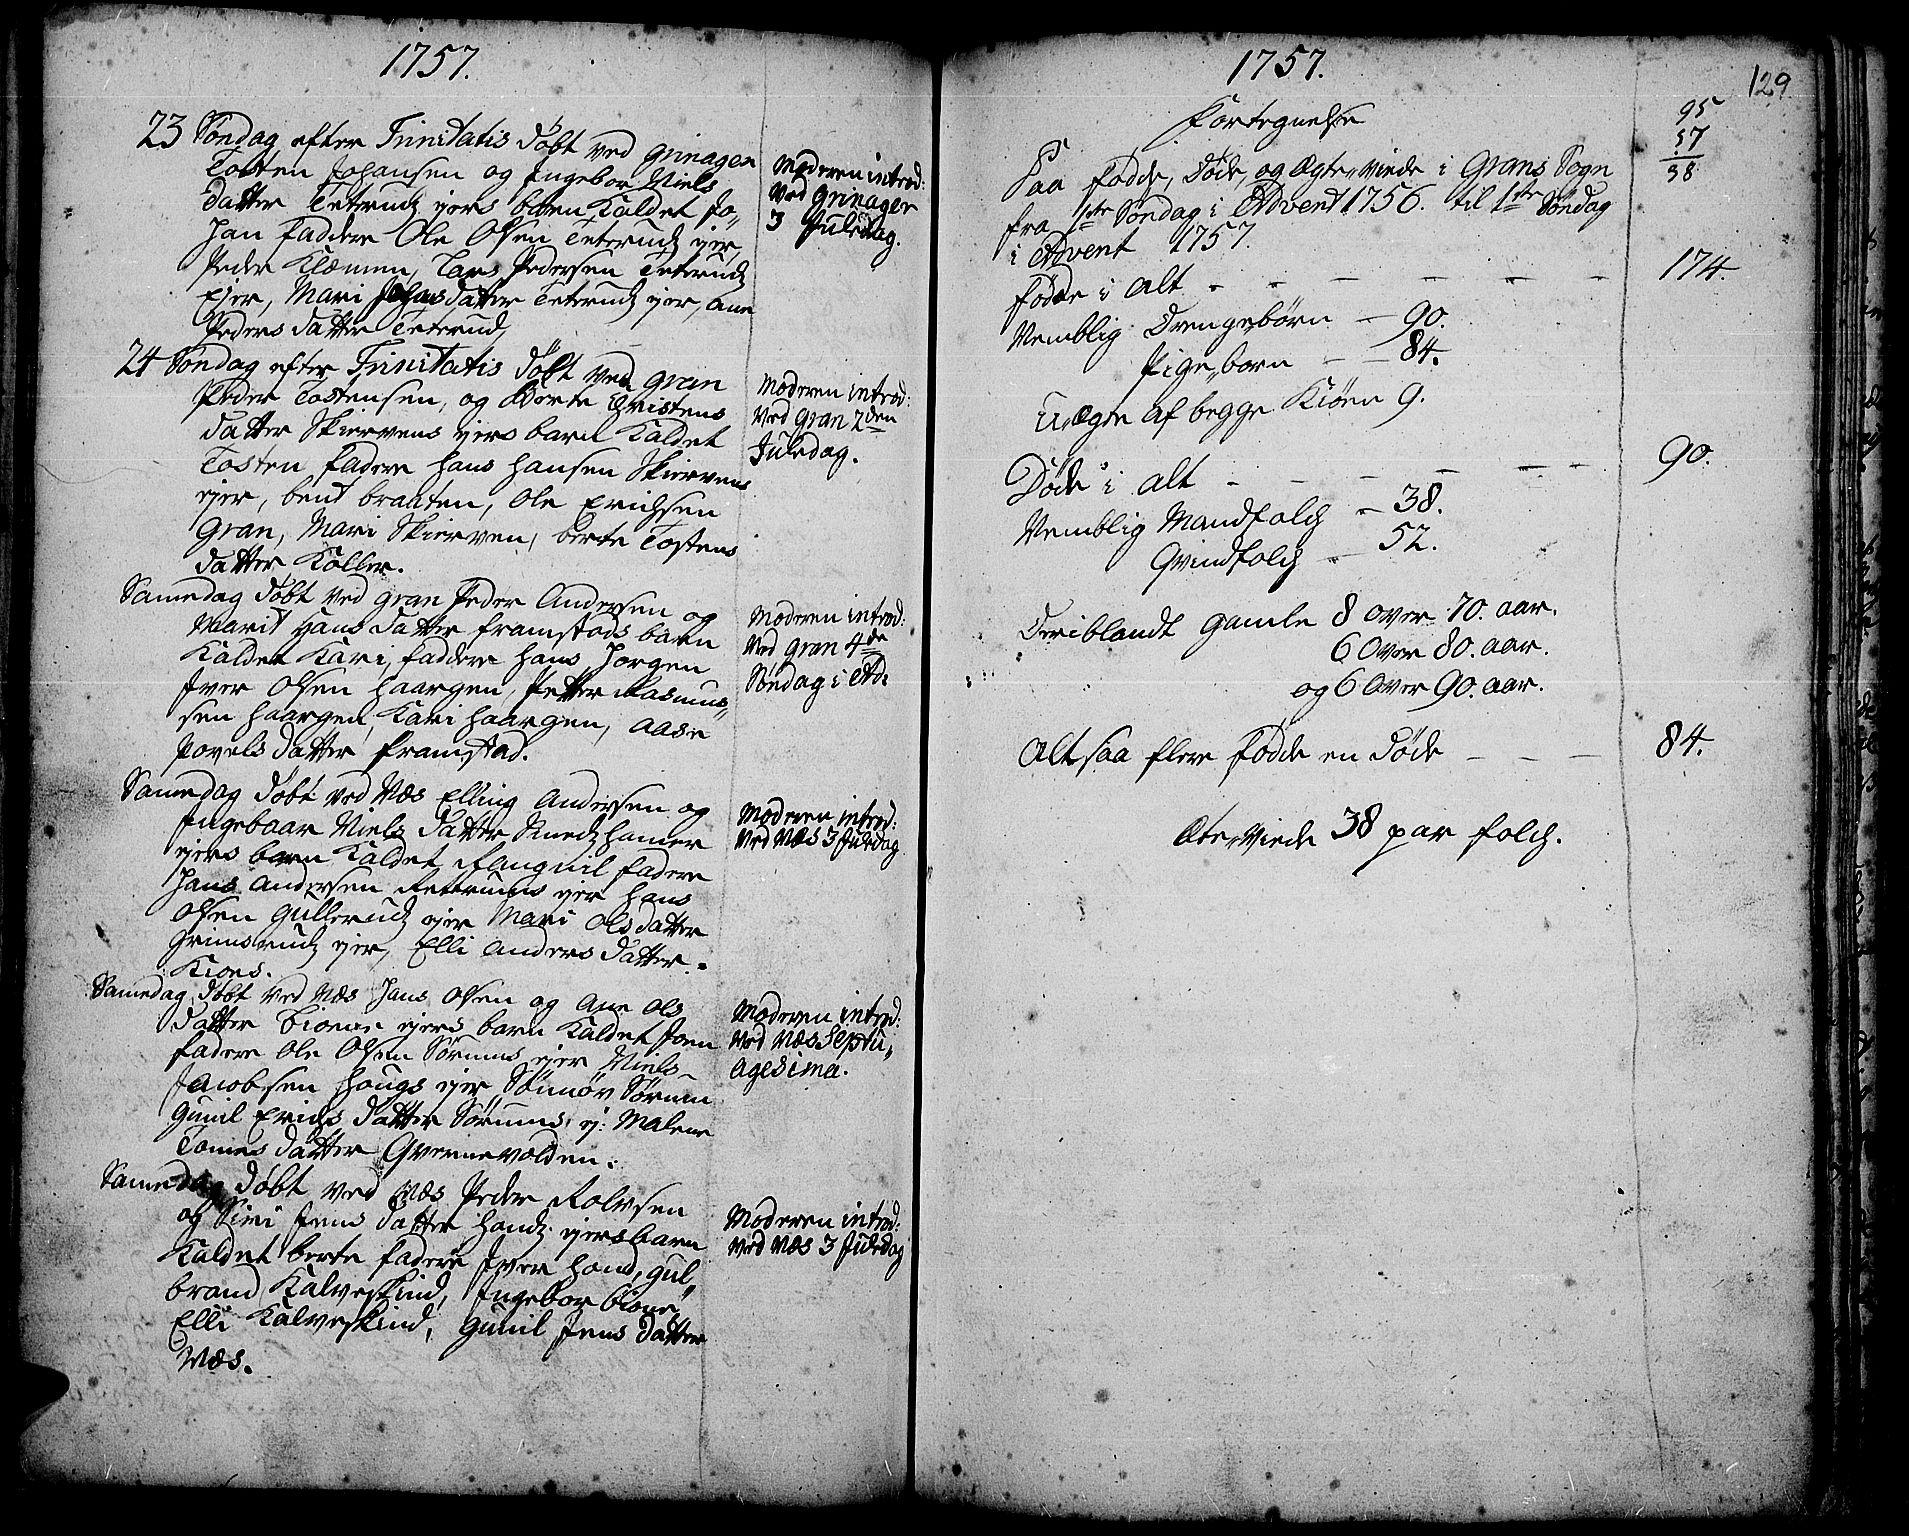 SAH, Gran prestekontor, Ministerialbok nr. 3, 1745-1758, s. 129